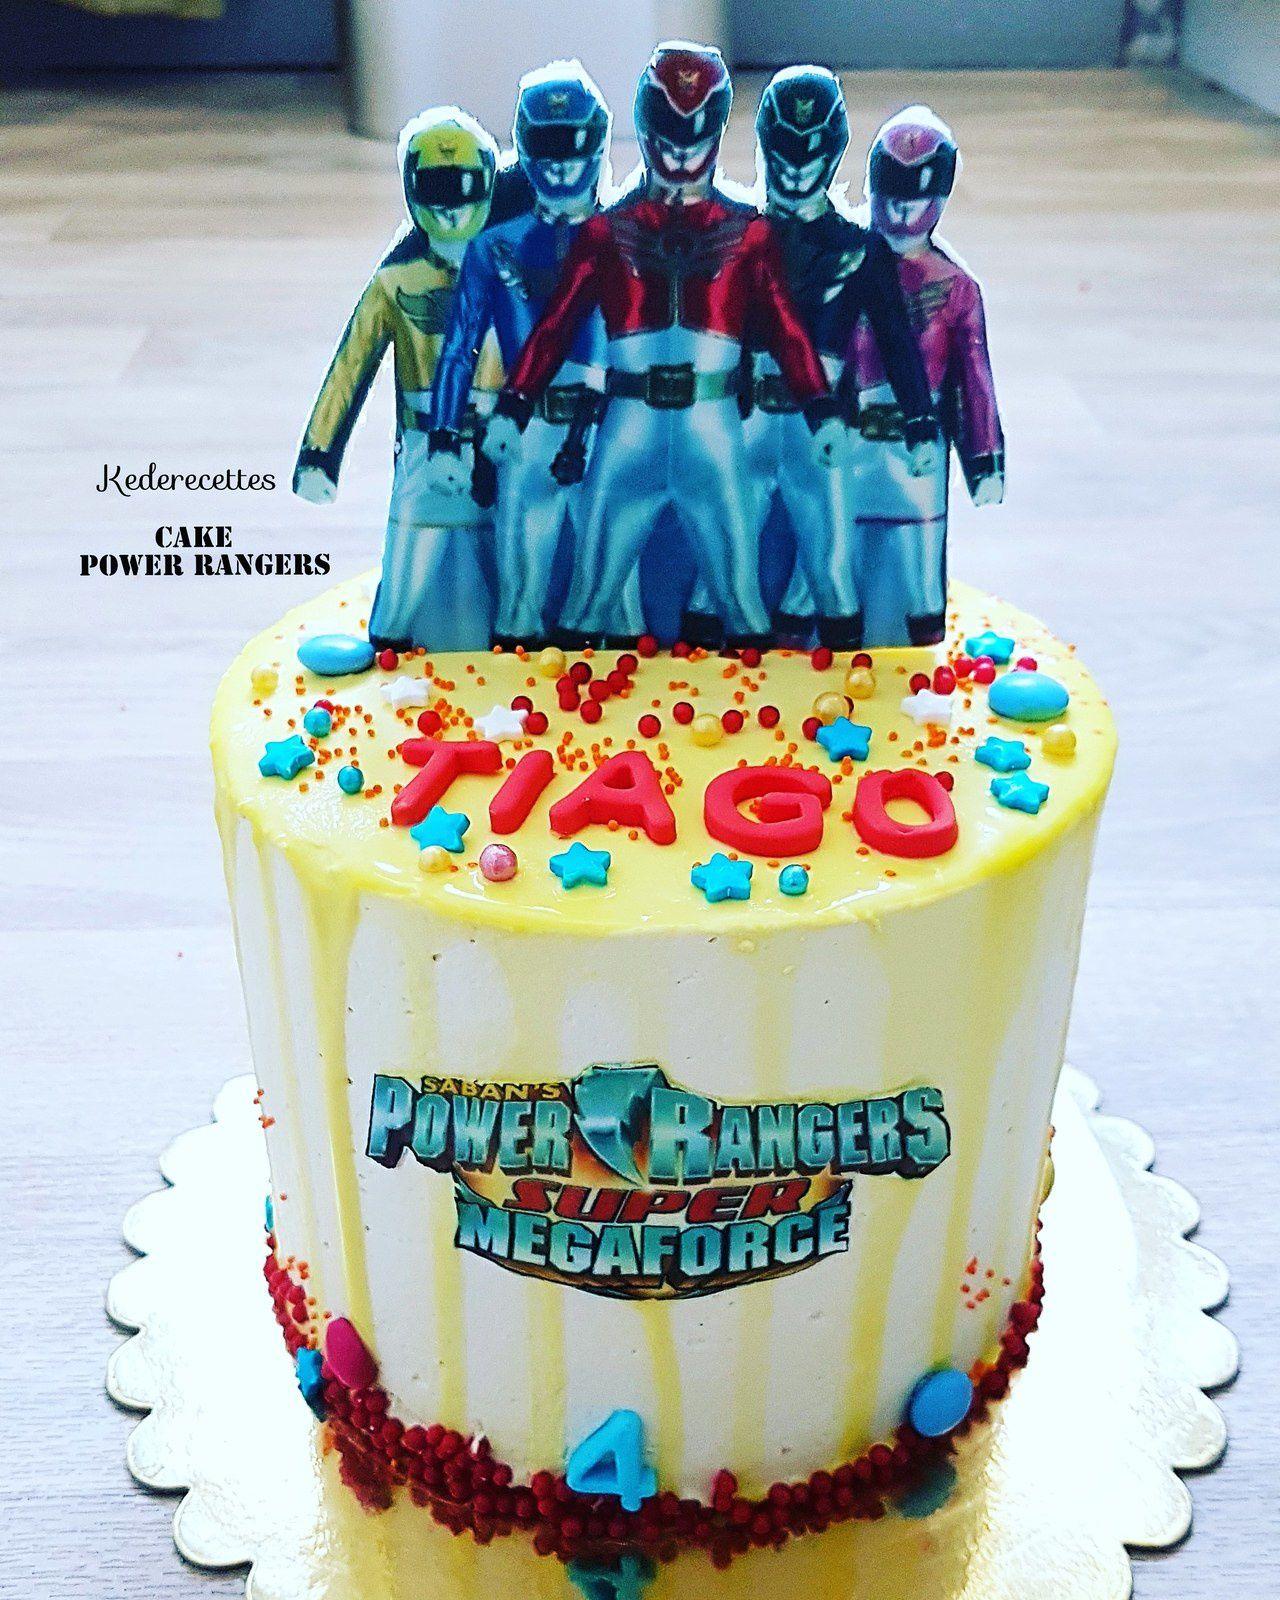 Layer Cake Power Rangers